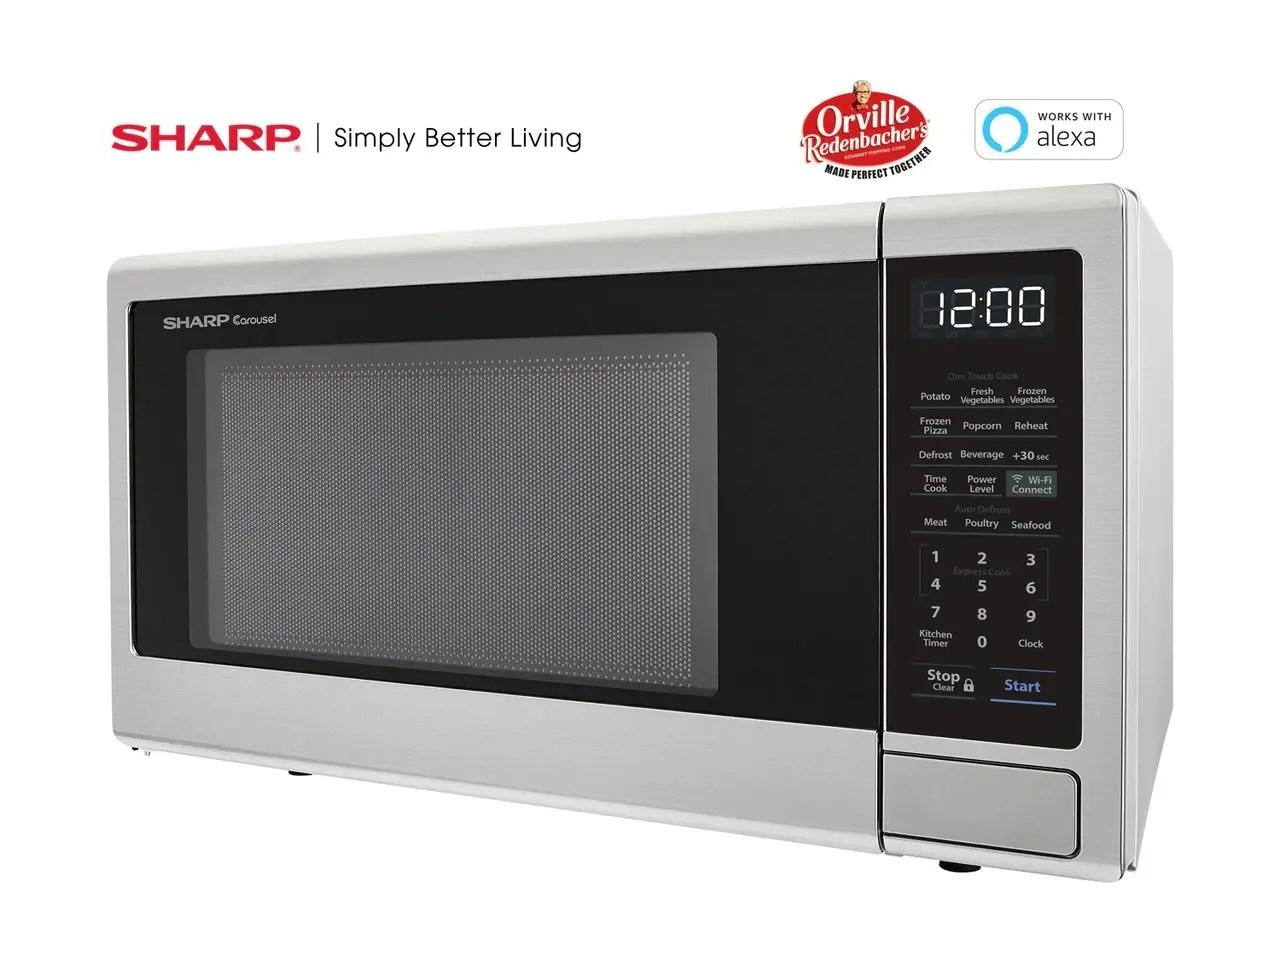 alexa compatible microwave